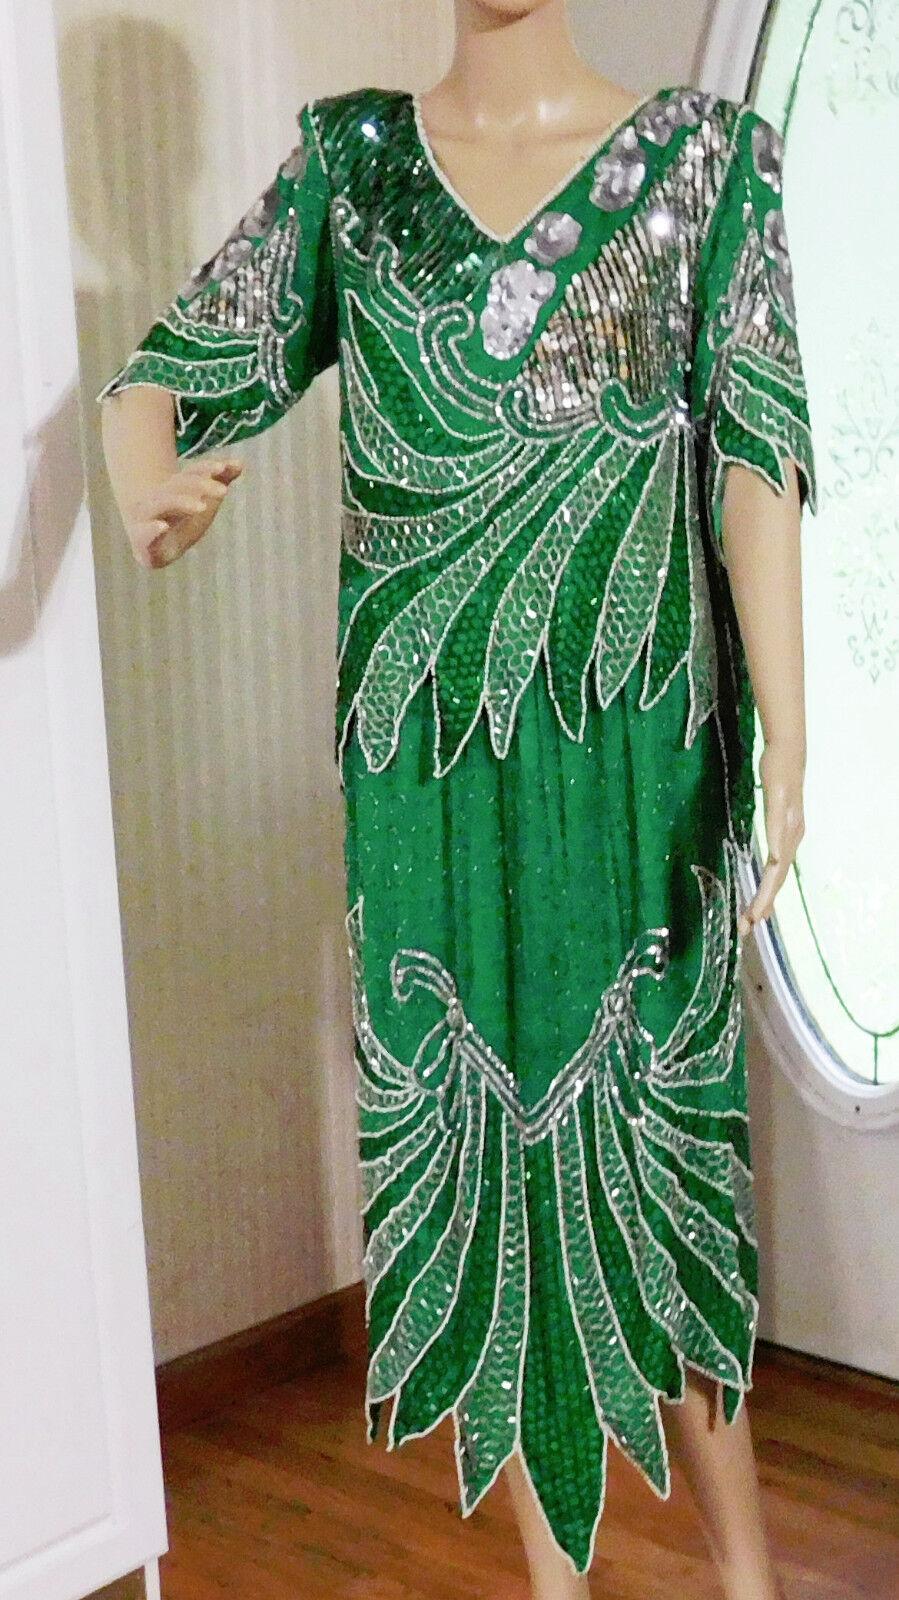 Anjumun Two Piece Beaded Dress - Woherren Größe S - 100% Silk - Made in India